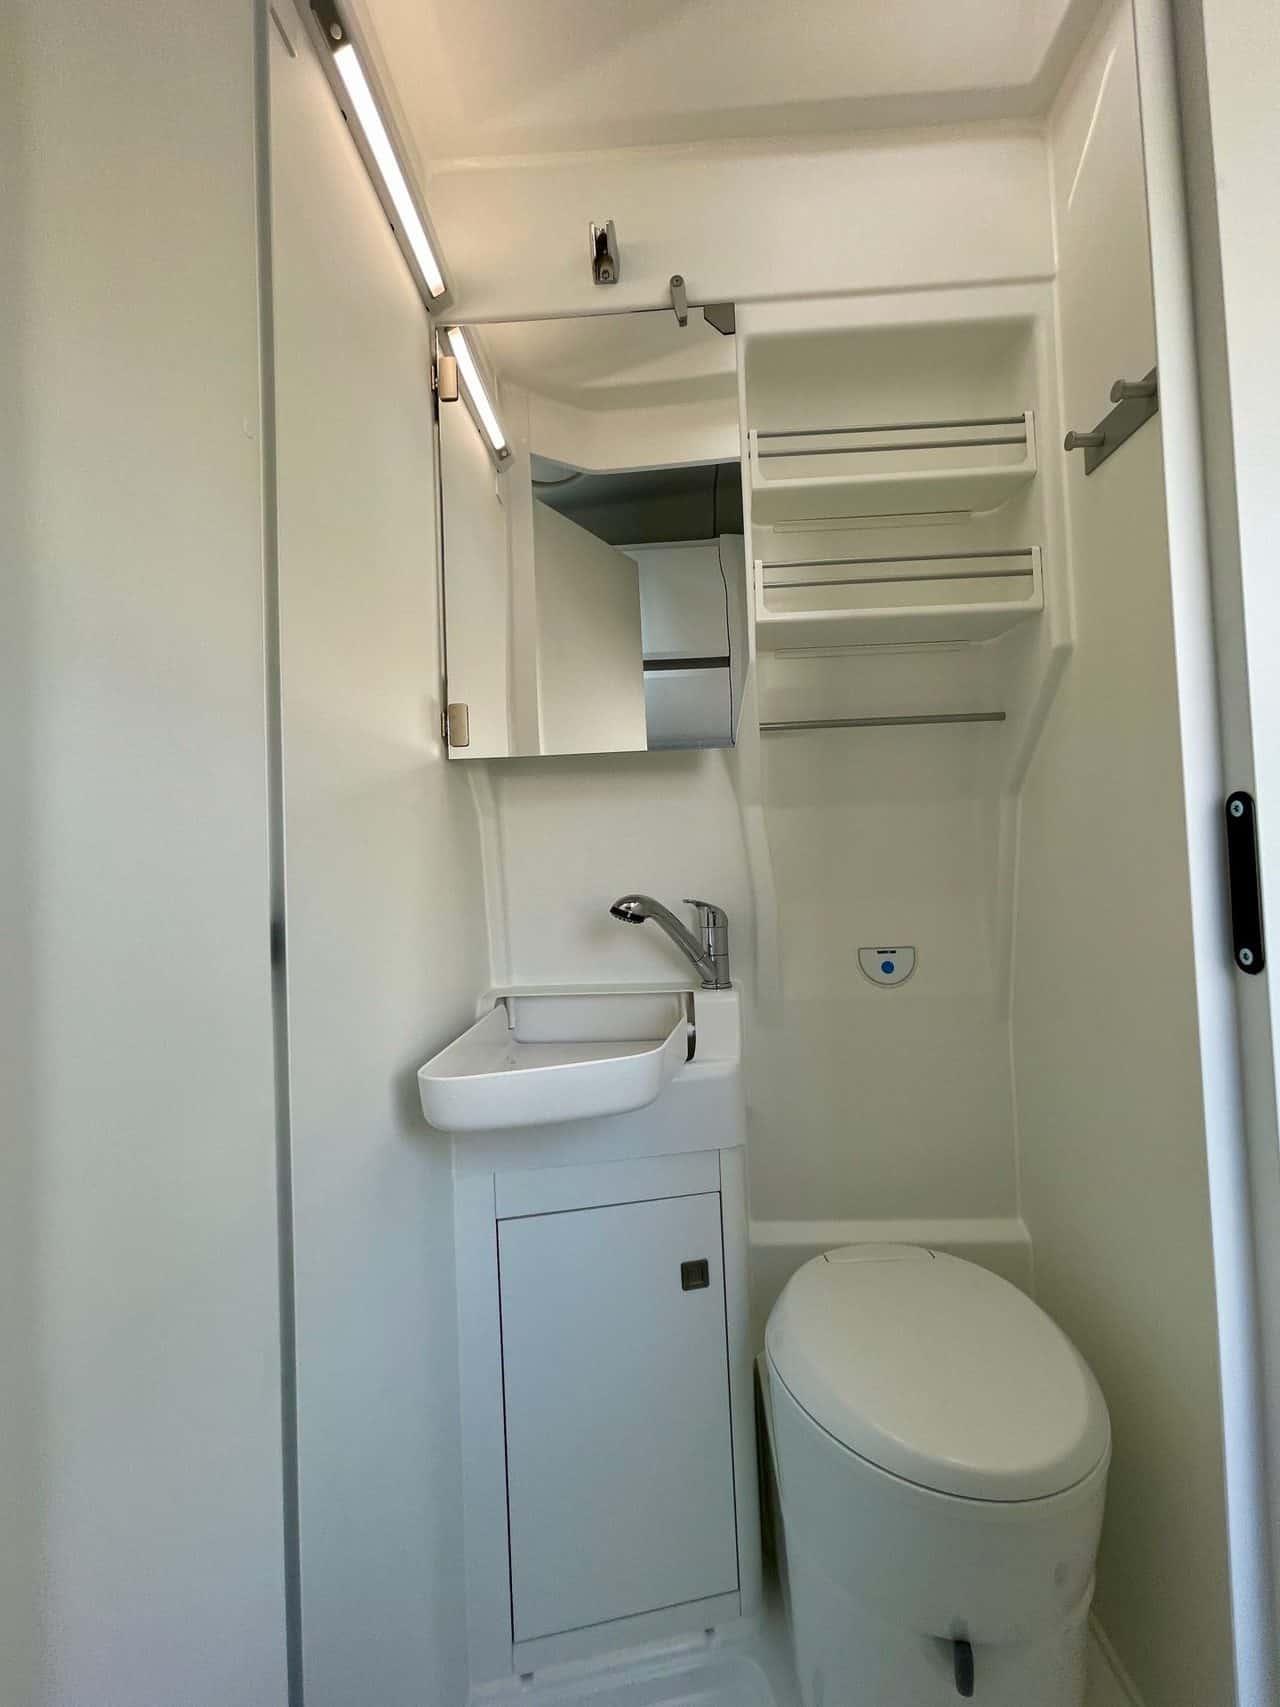 Camerboys-Camper-Wohnmobil-Vermietung-VW-Grand-California-Dusche-Bad-WC